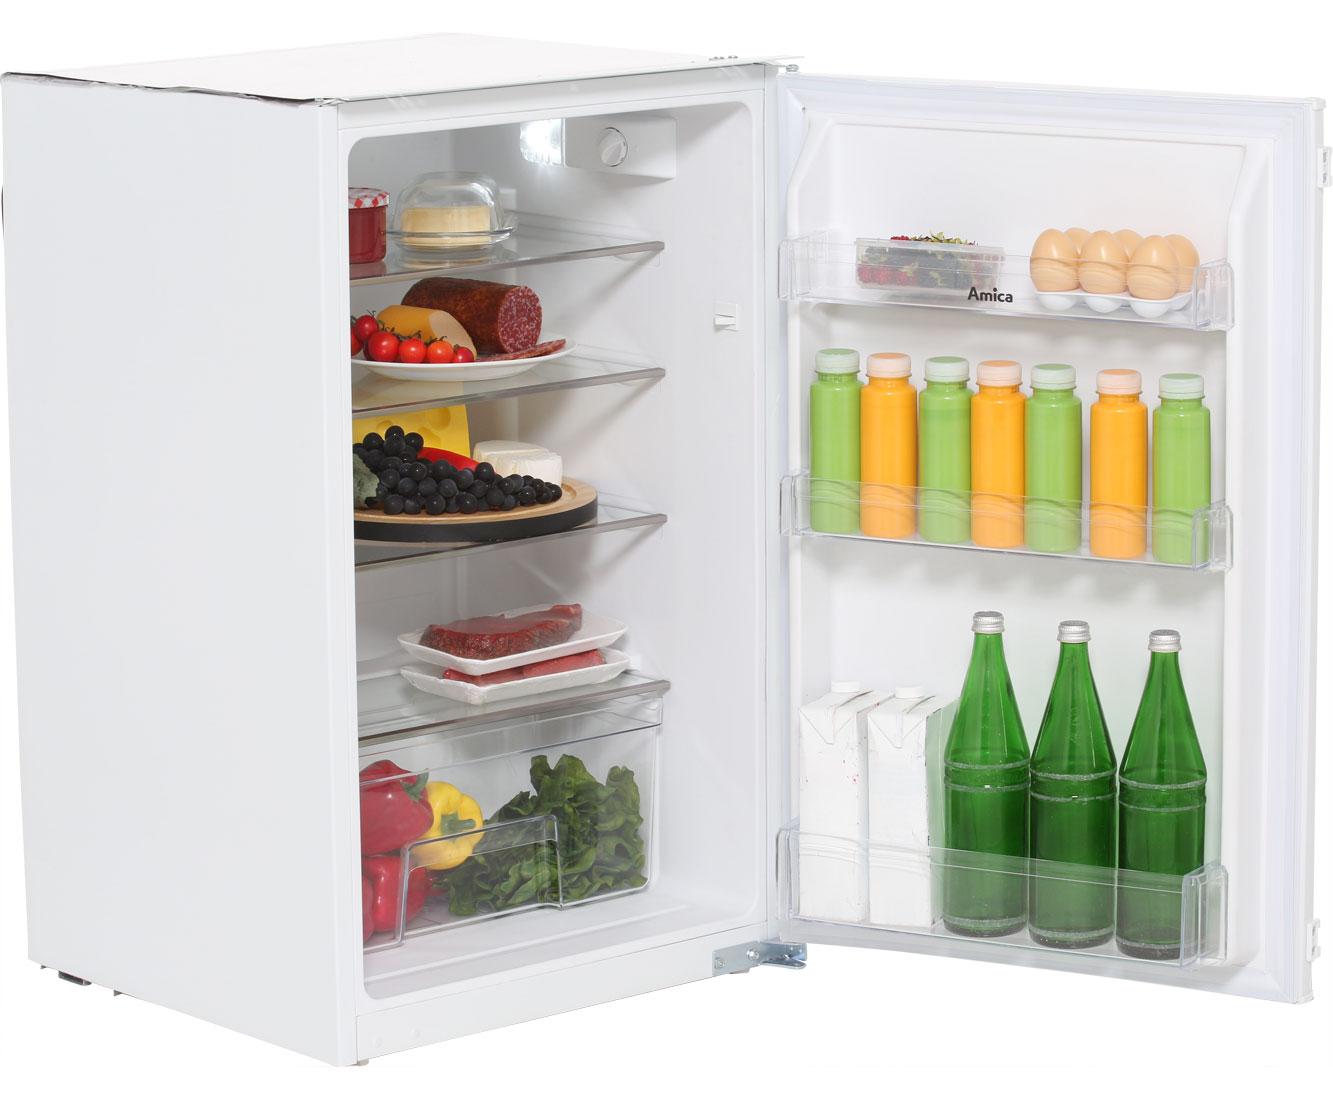 Bomann Kühlschrank Retro Test : Bomann retro kühlschrank test side by side kühlschrank kaufen